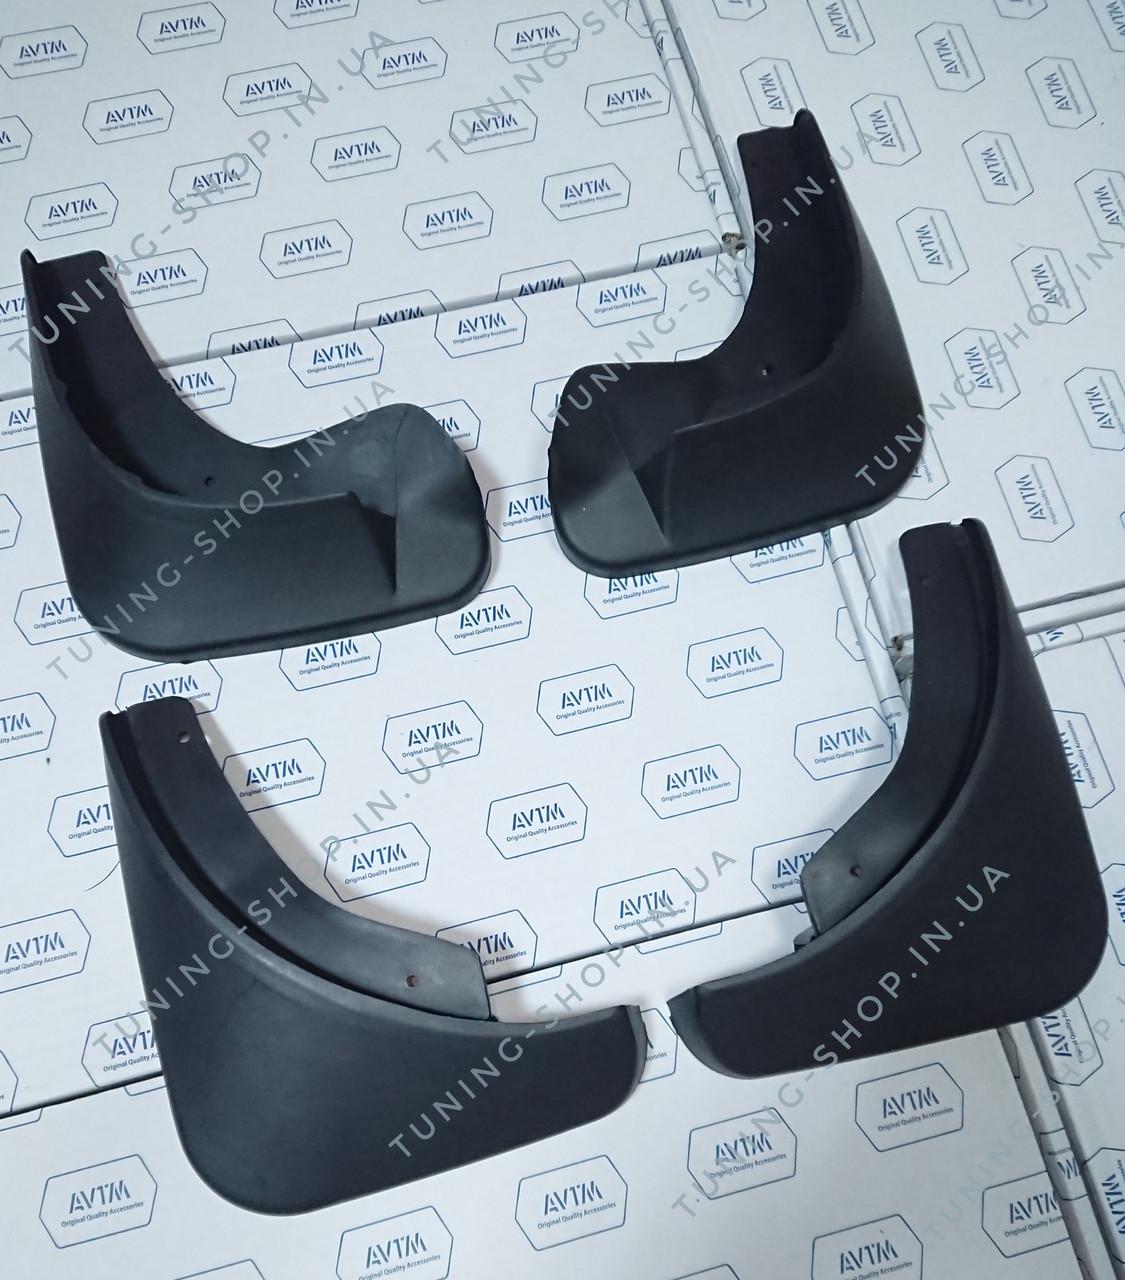 Брызговики Skoda Fabia 2007-2014 хэтчбек ( комплект 4 шт ), AVTM